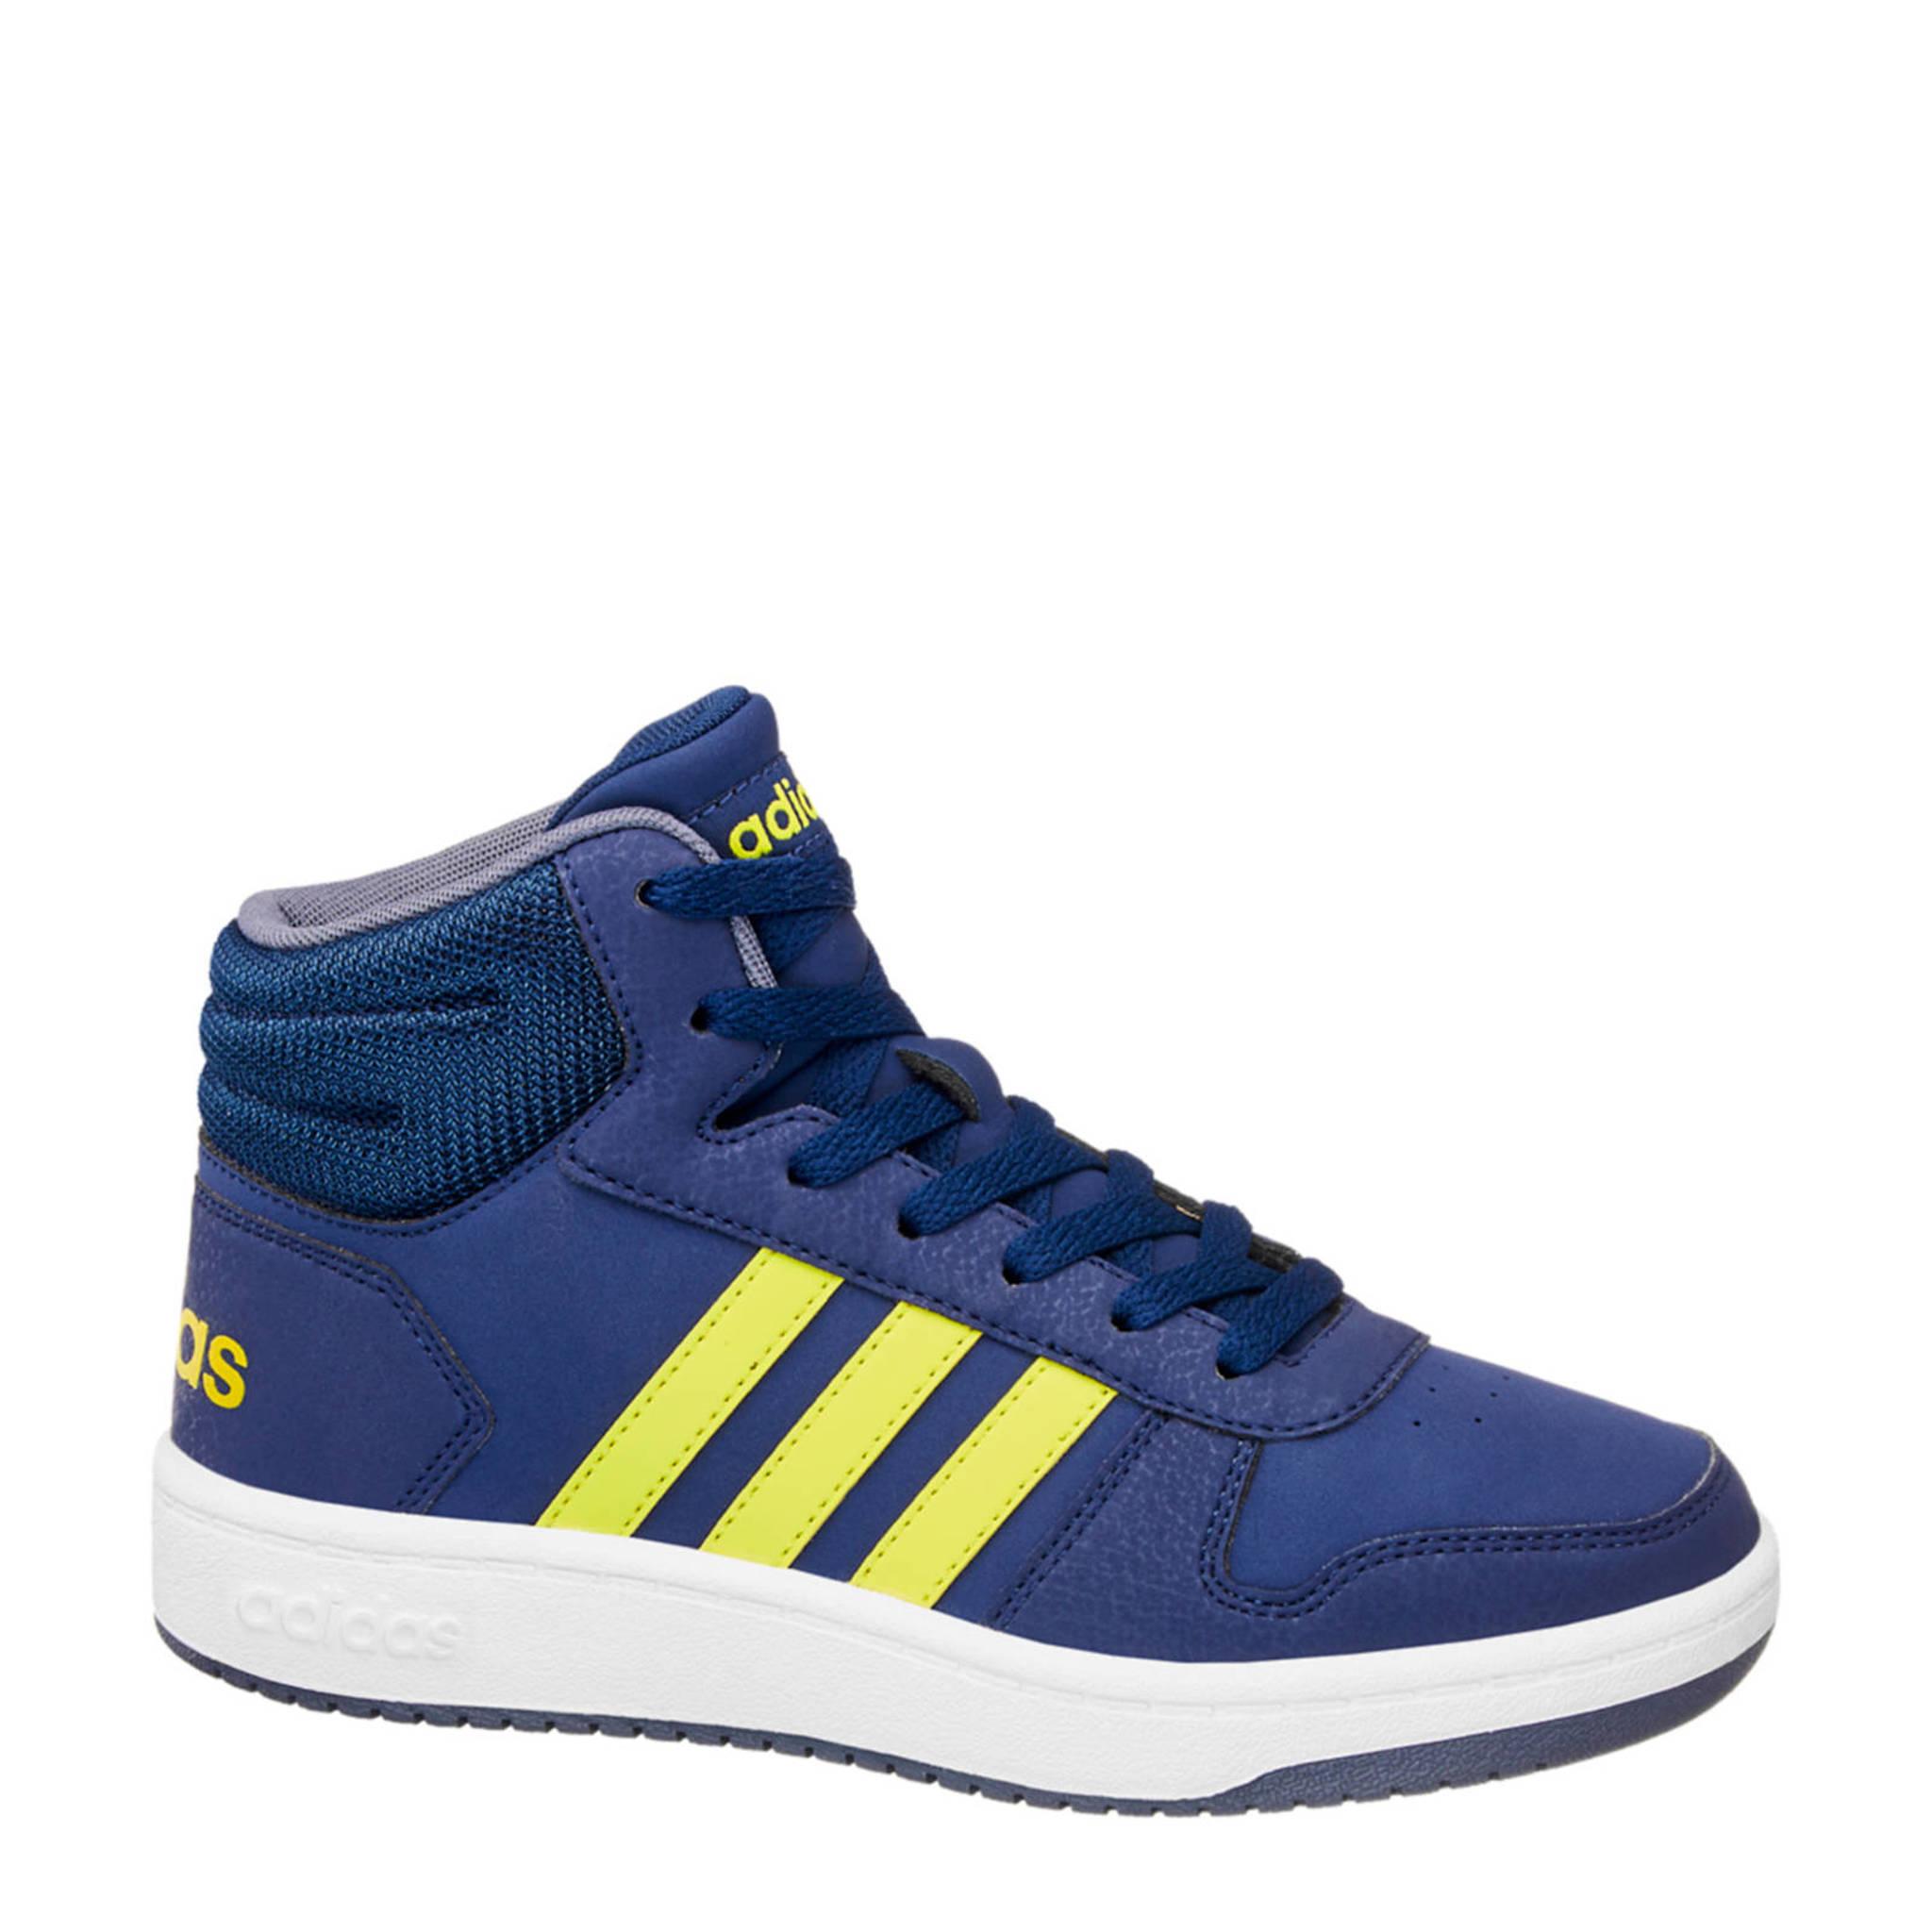 pretty nice 5ca5f 0cc42 adidas Hoops Mid 2.0 sneakers blauw  wehkamp